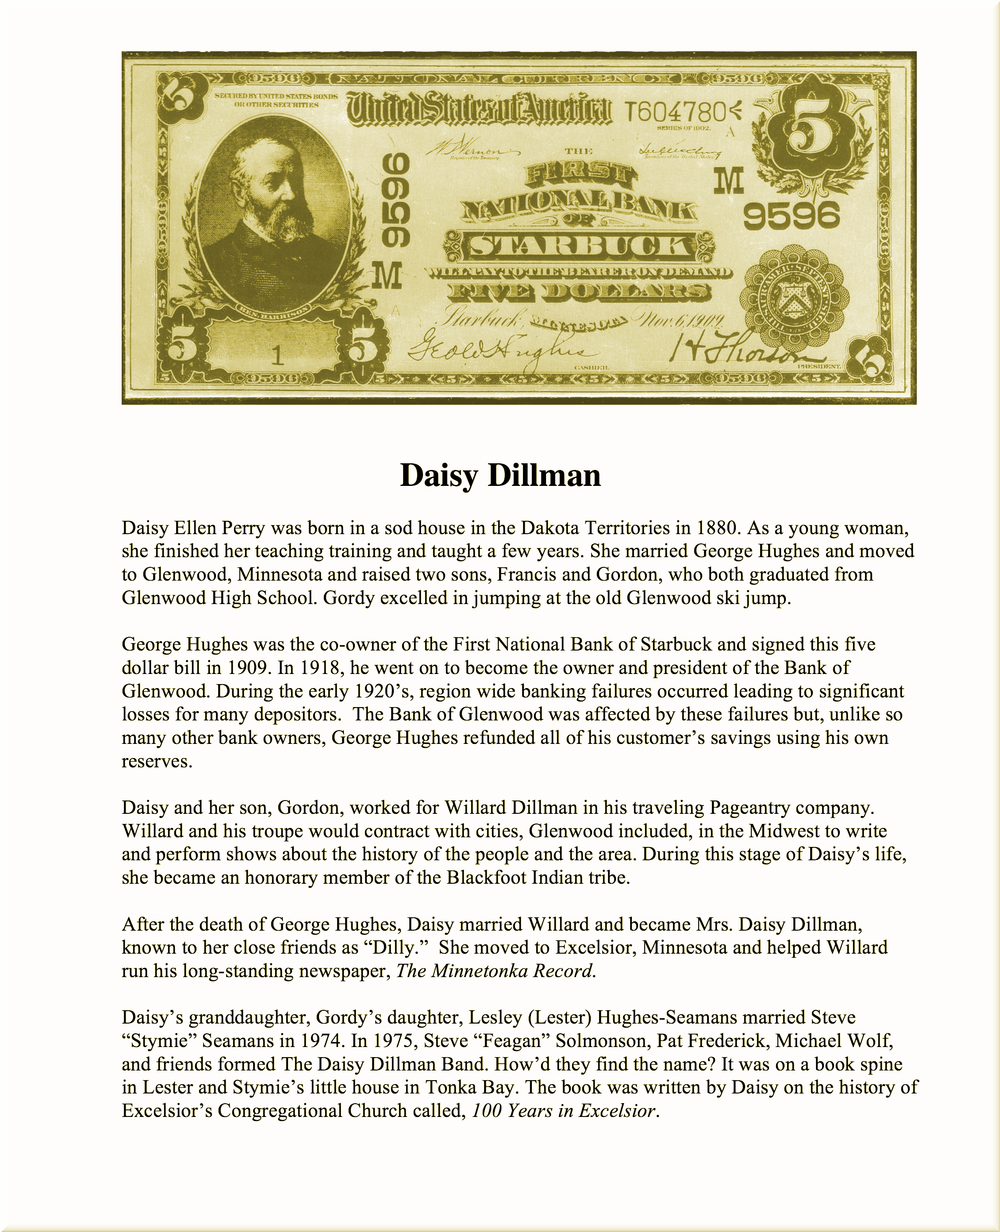 history of daisy.jpg